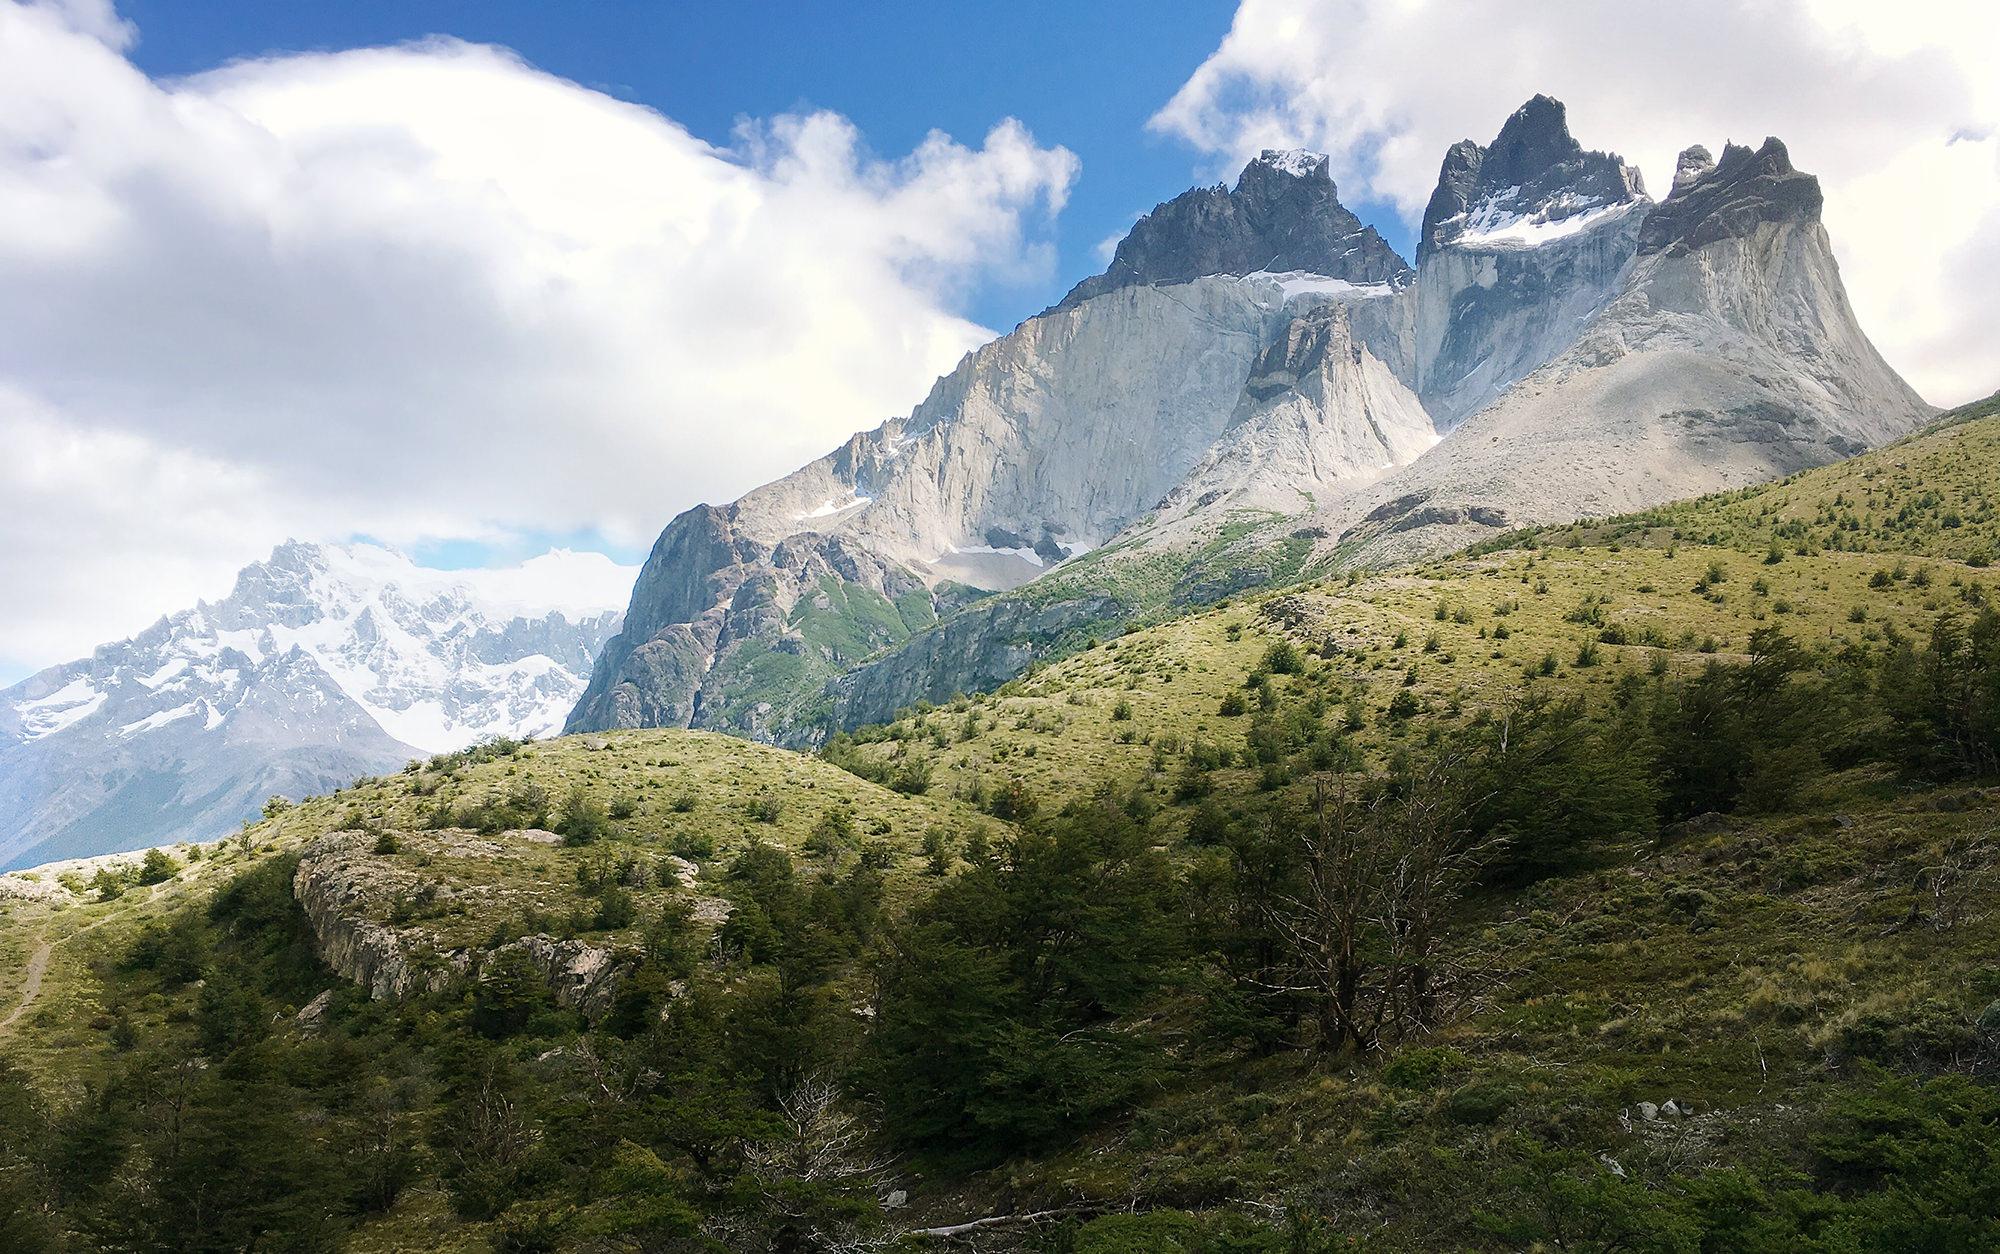 W Circuit is Torres del Paine's most famous trek